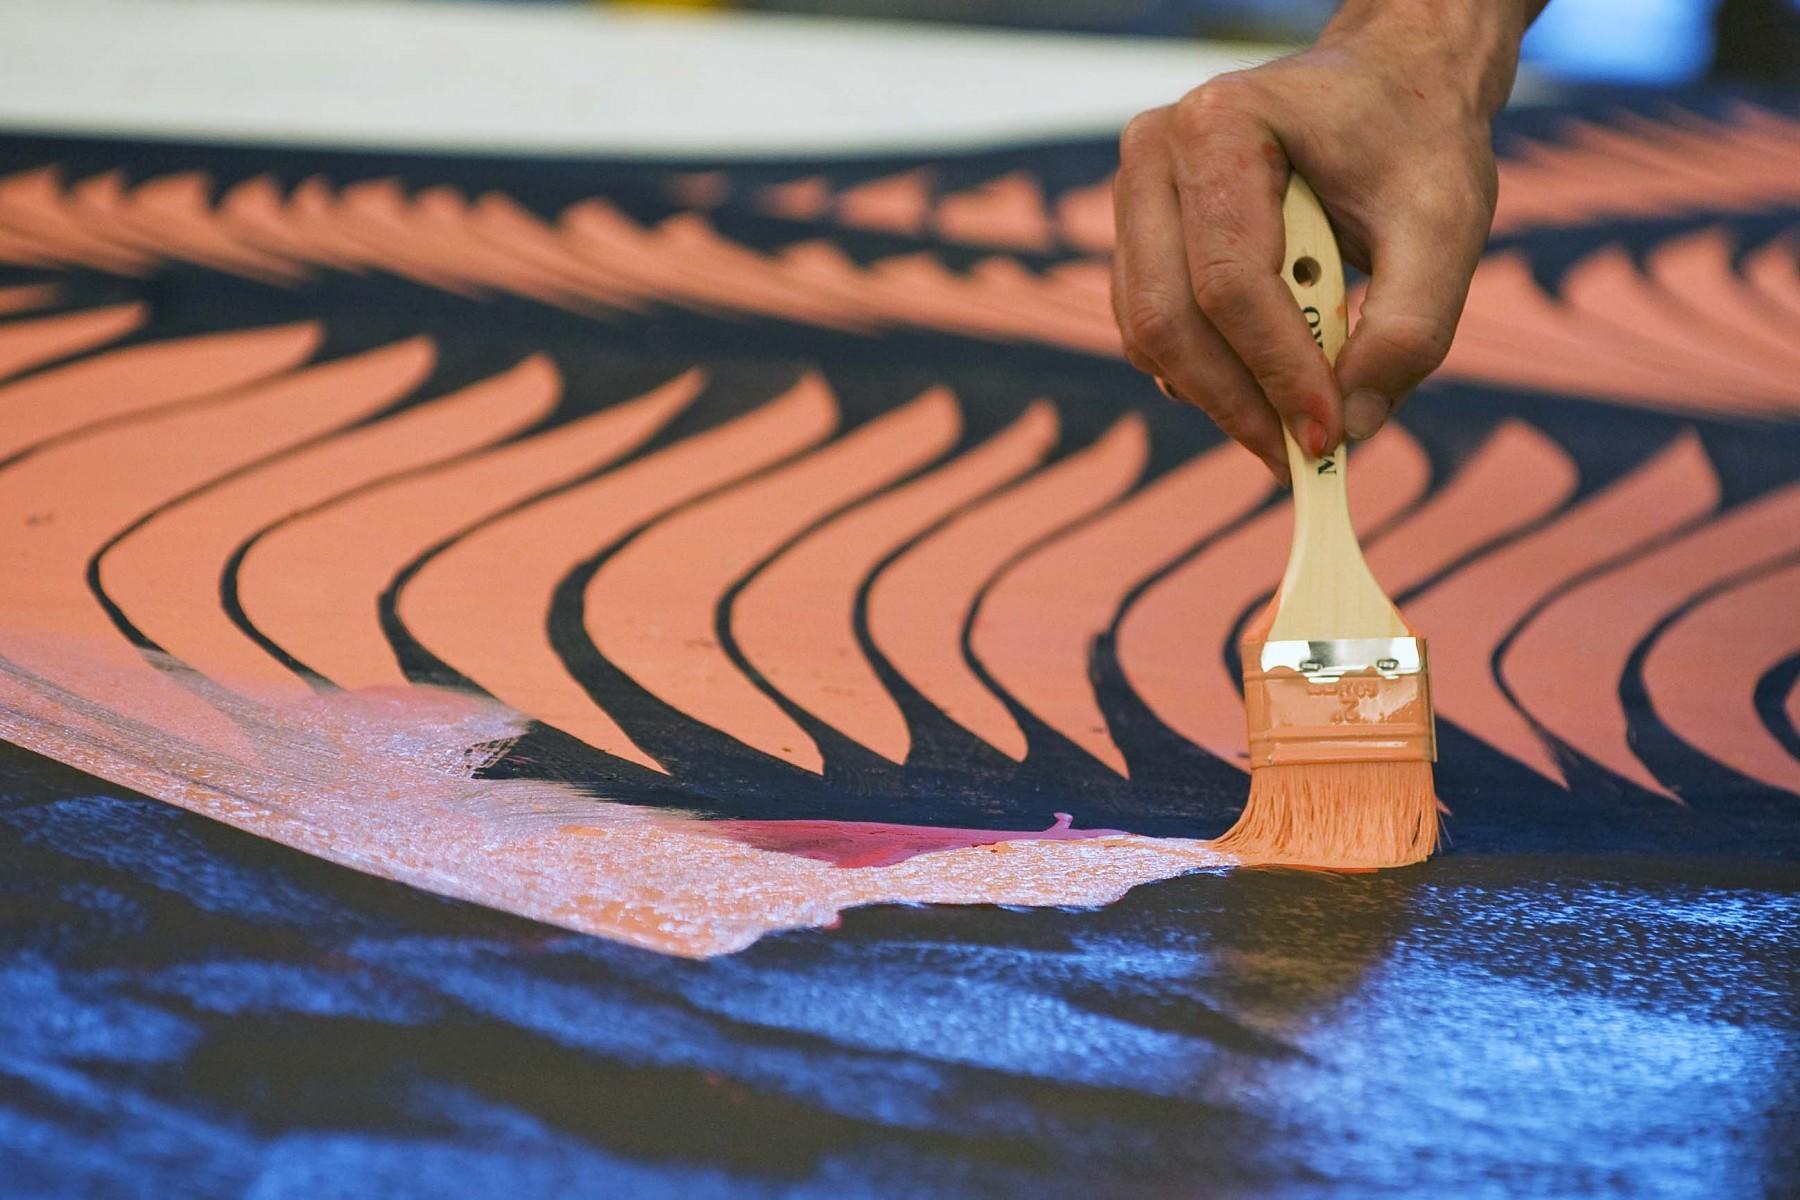 paintbrush against surface